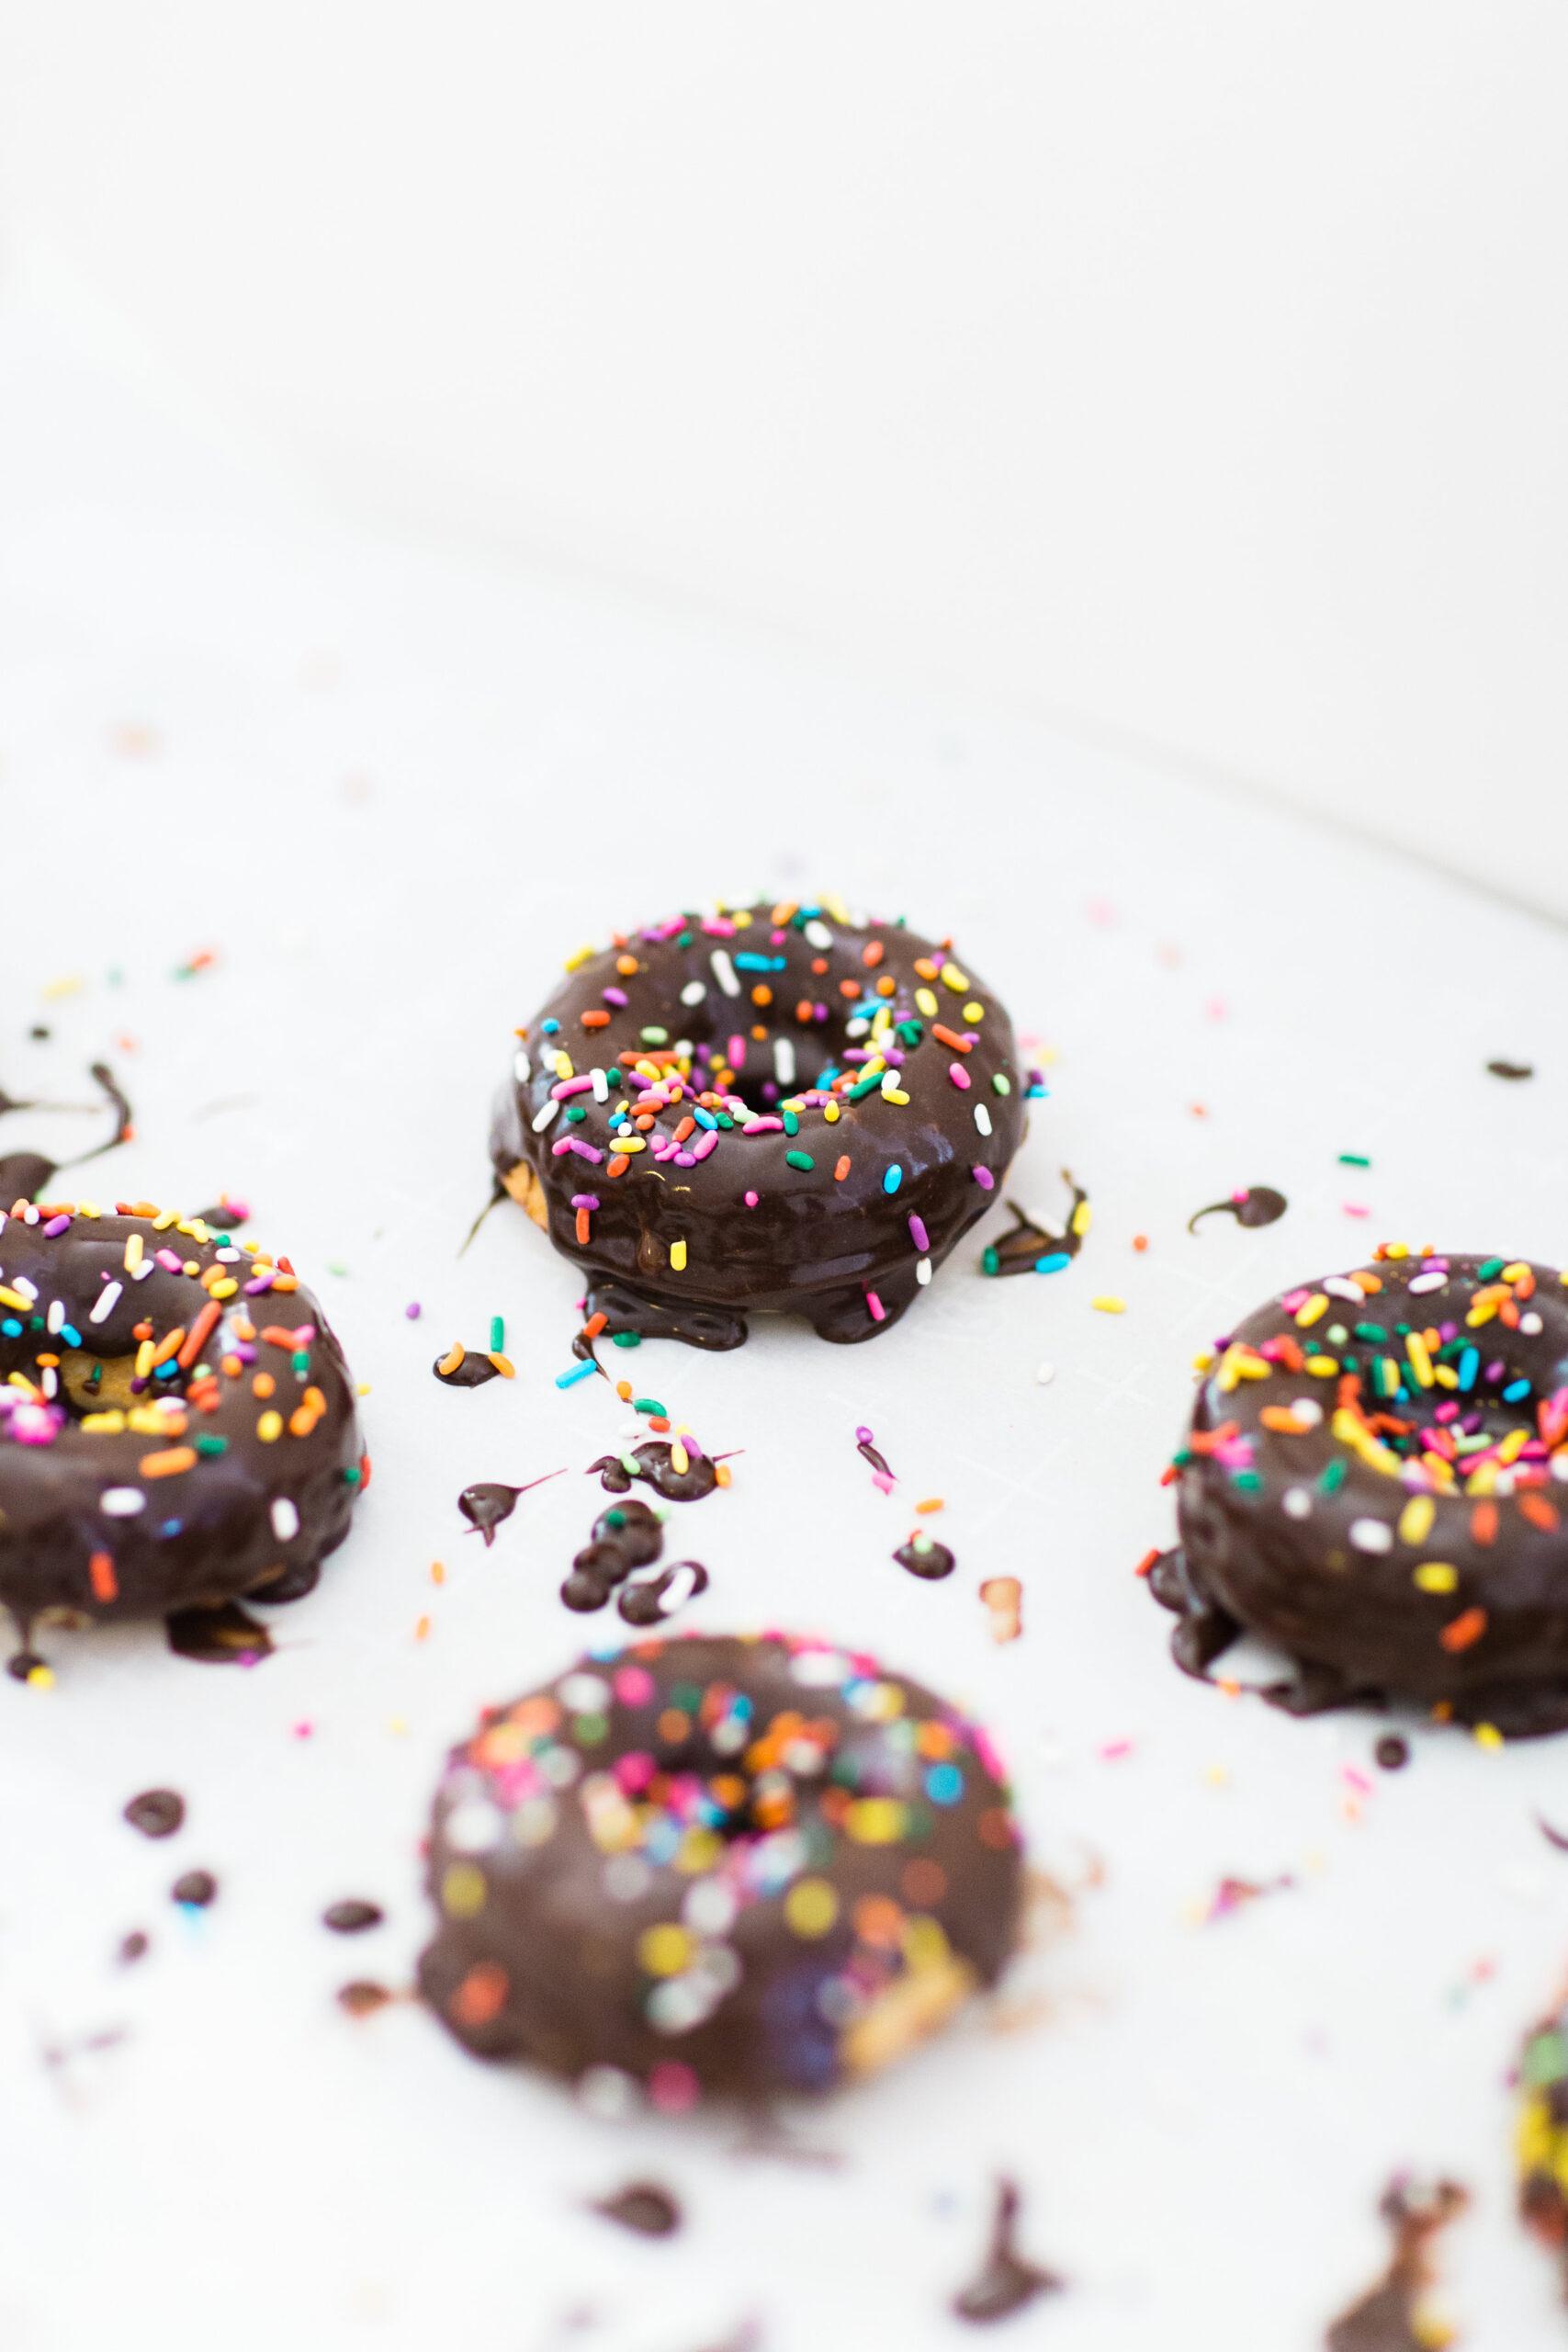 How to Make Easy Cake Mix Donuts - Baked Doughnuts - | @glitterinclexi | GLITTERINC.COM